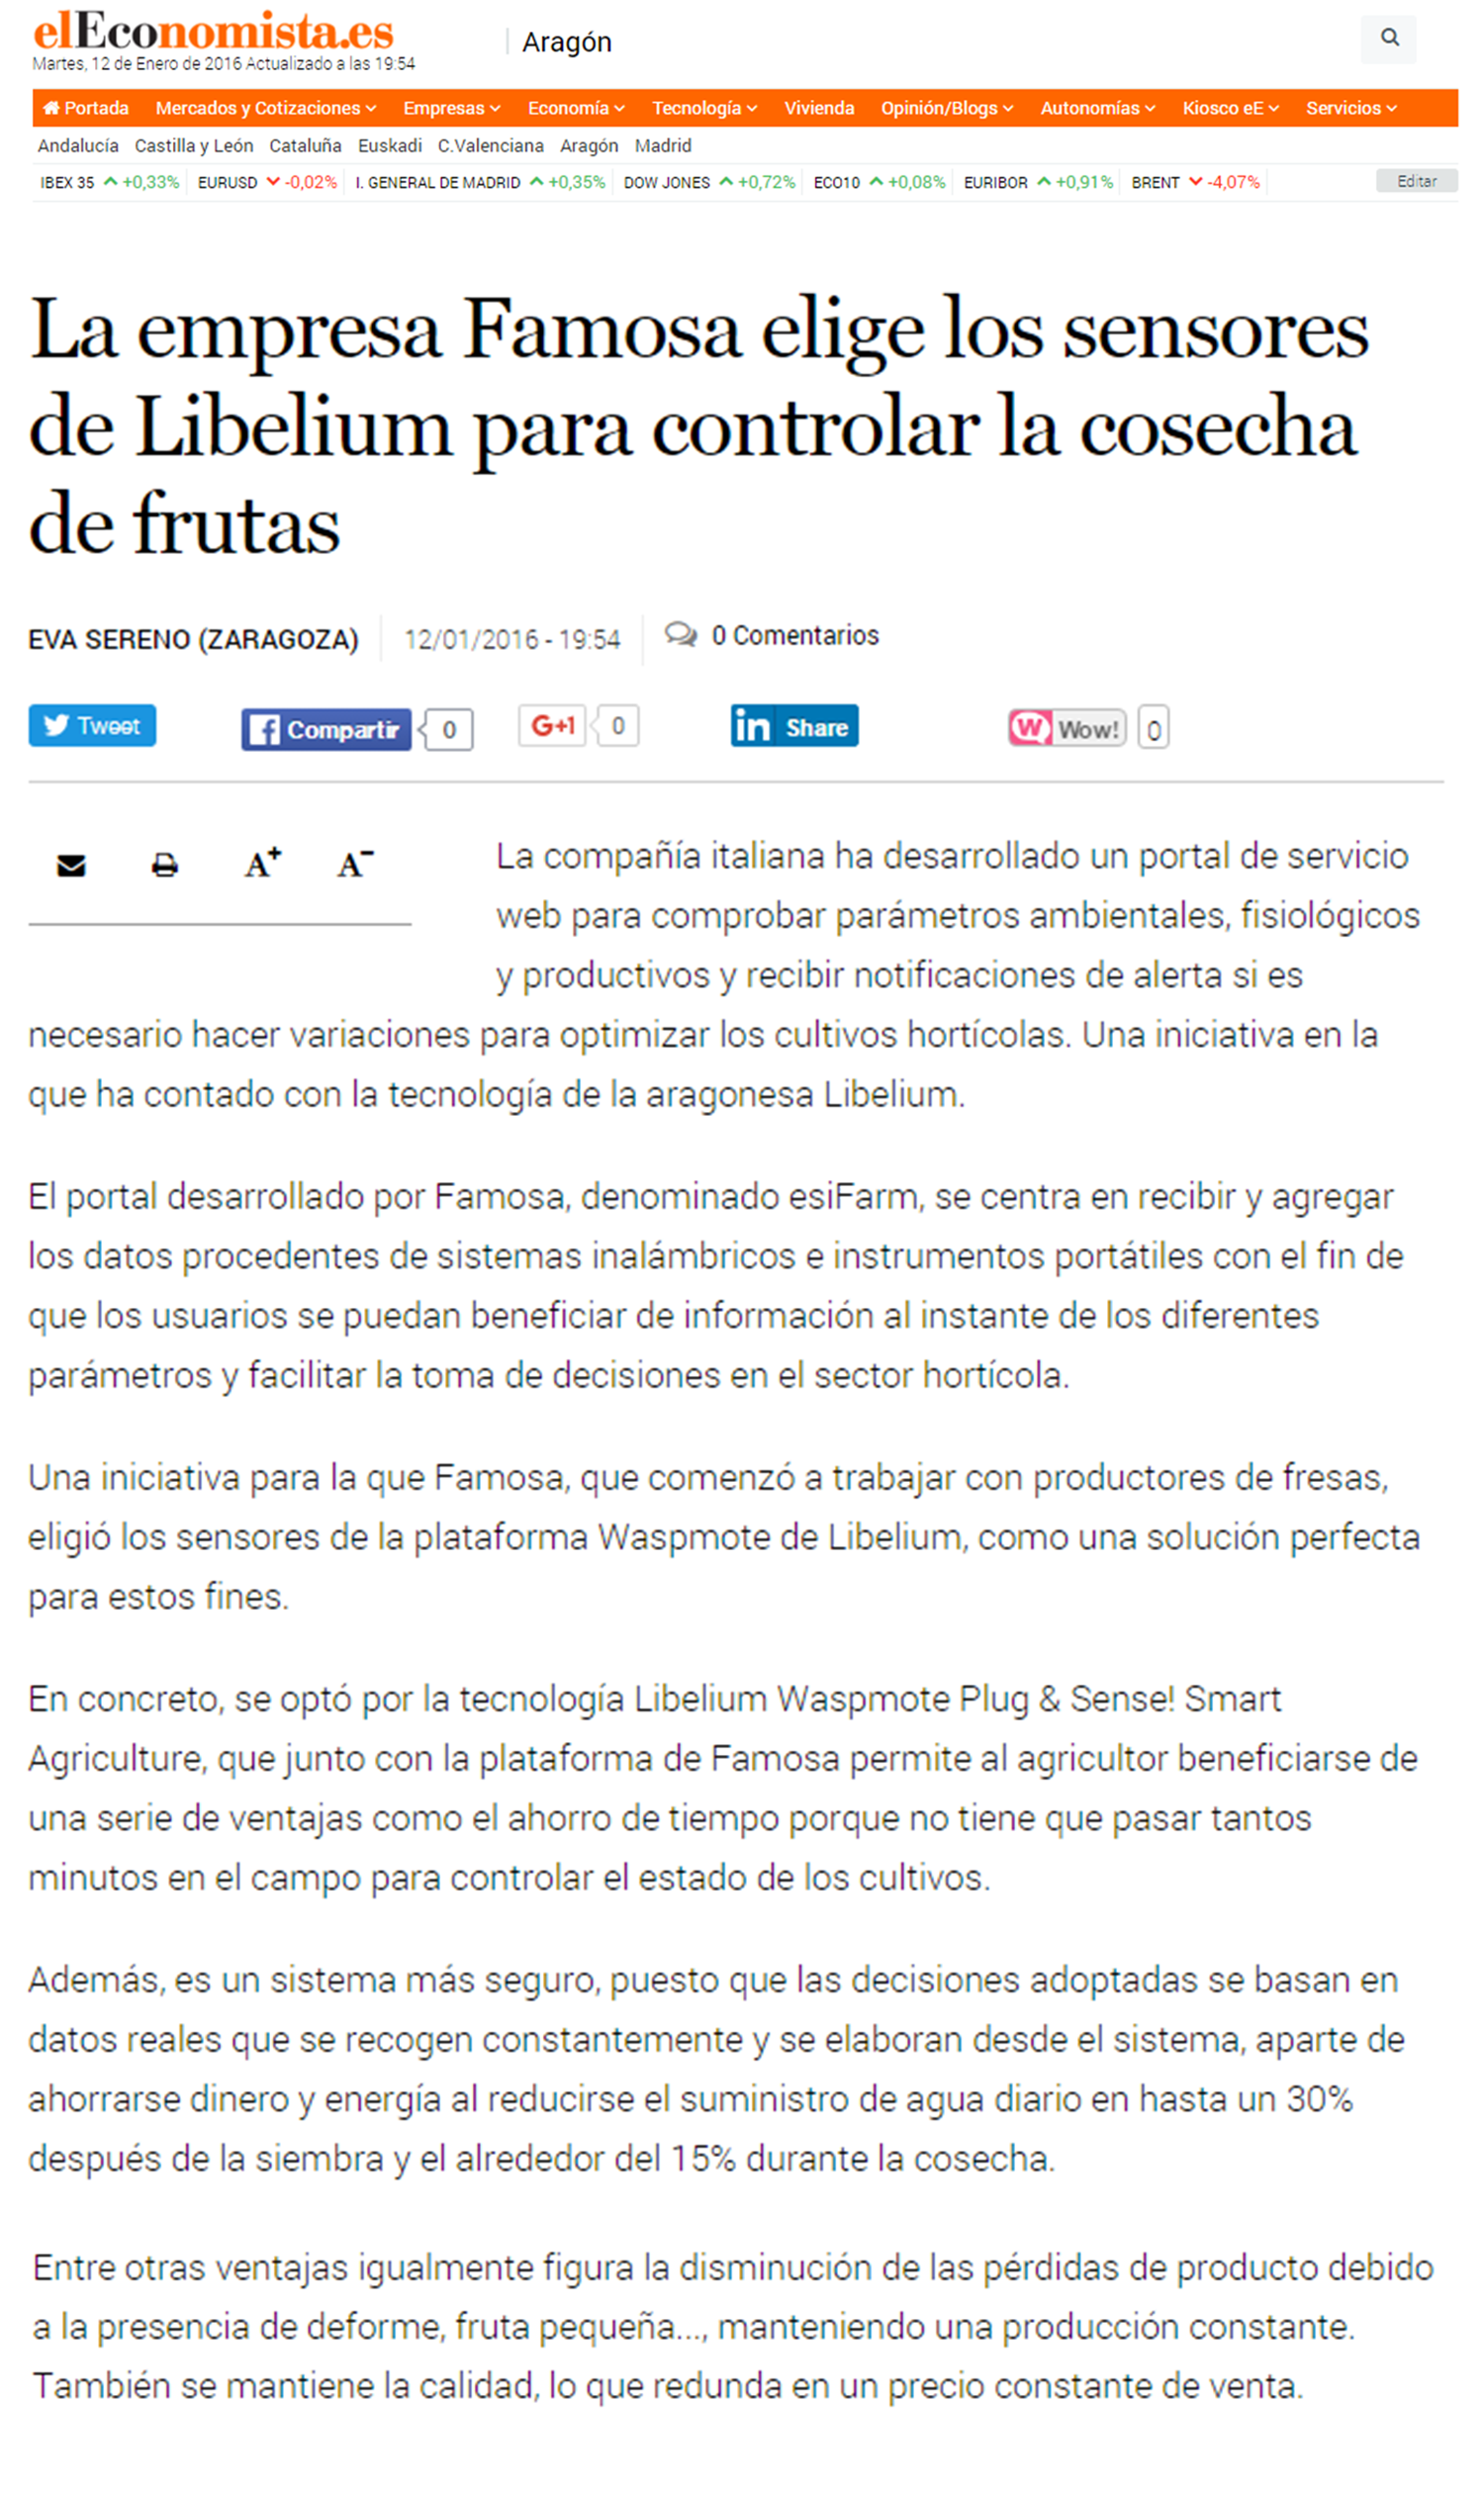 La empresa Famosa elige los sensores de Libelium para controlar la cosecha de frutas